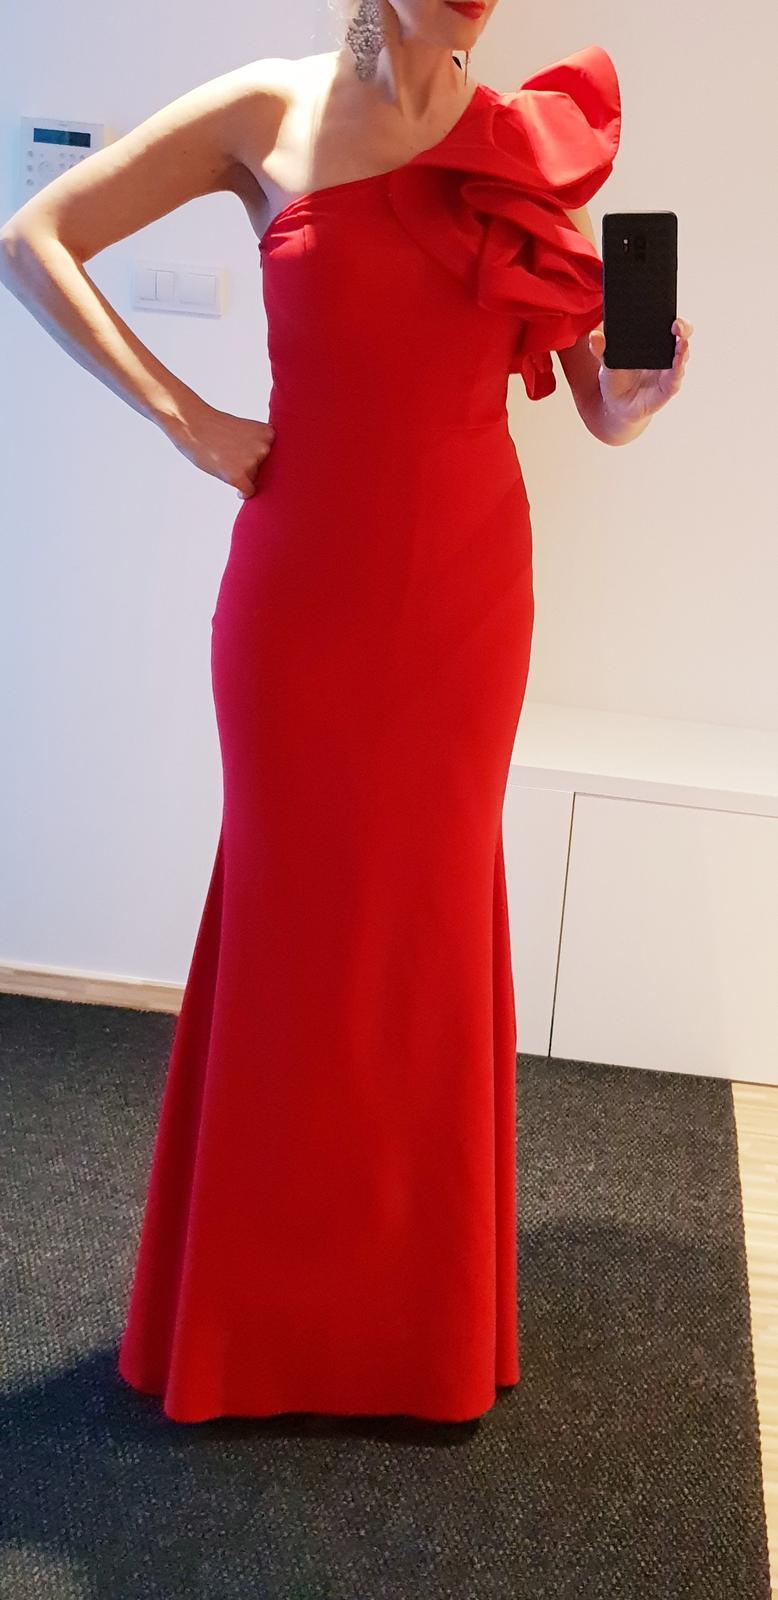 Červené dlhé šaty - Obrázok č. 1